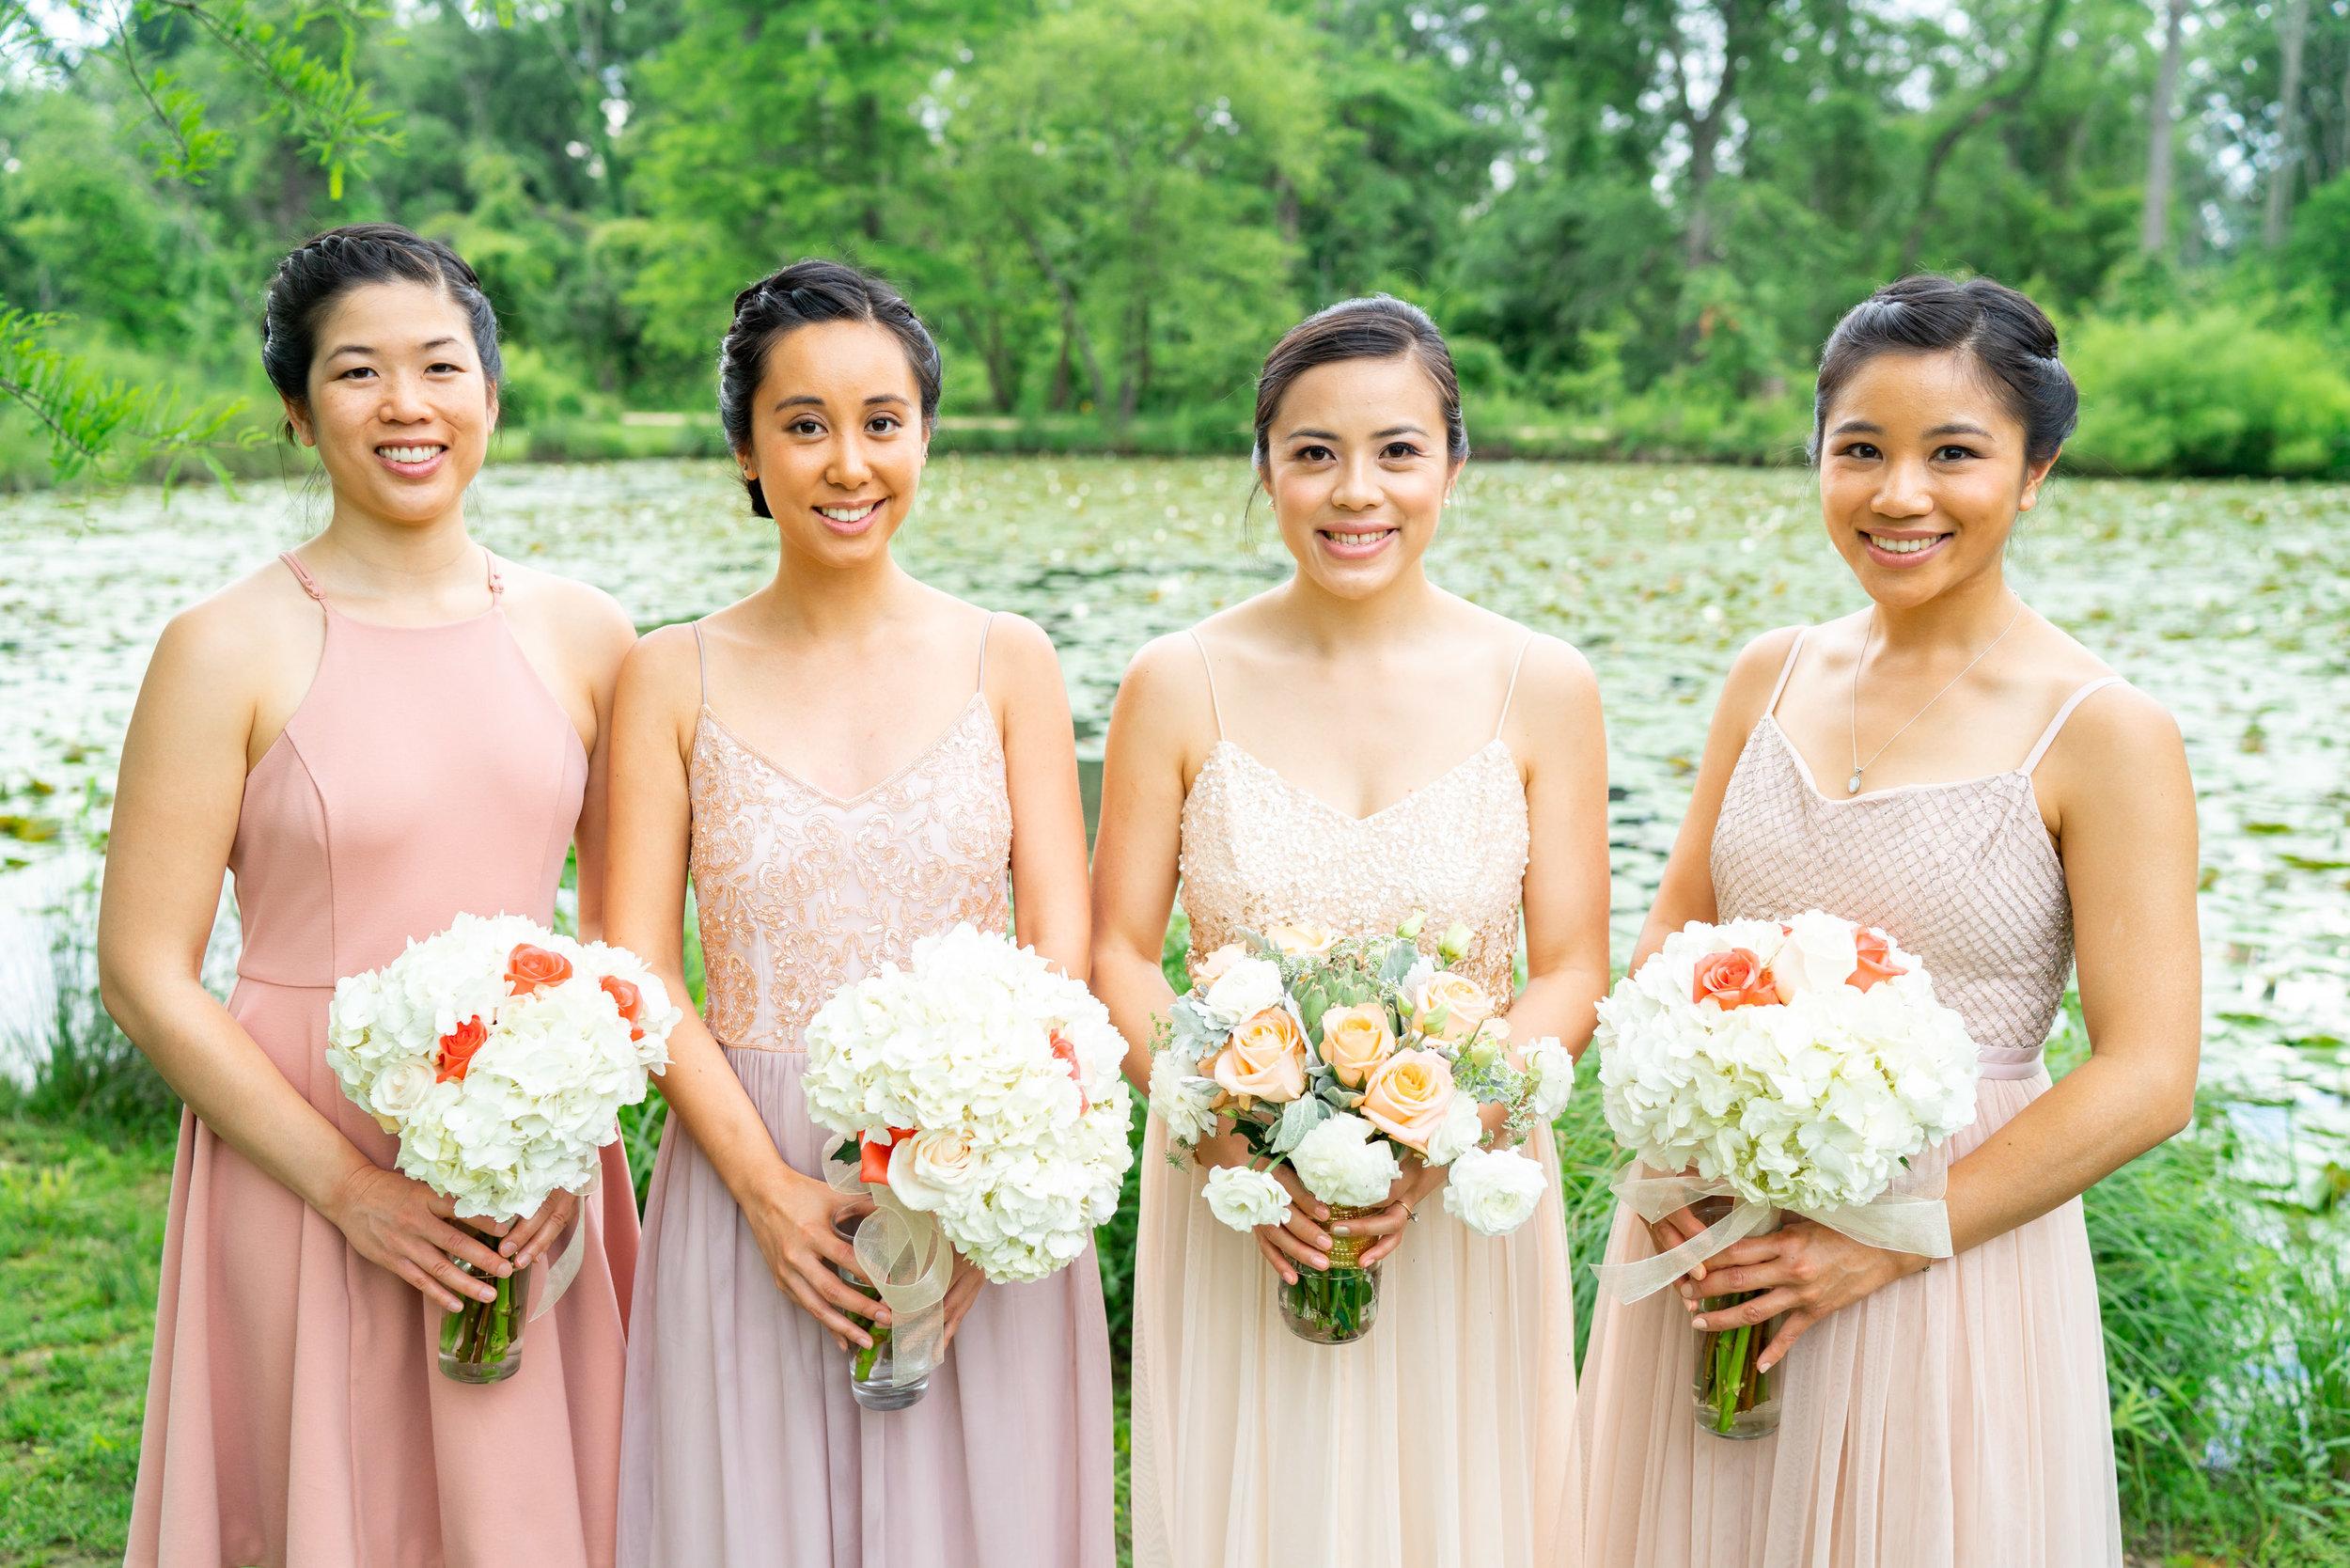 Kenilworth Aquatic Gardens portrait of bride and bridesmaids